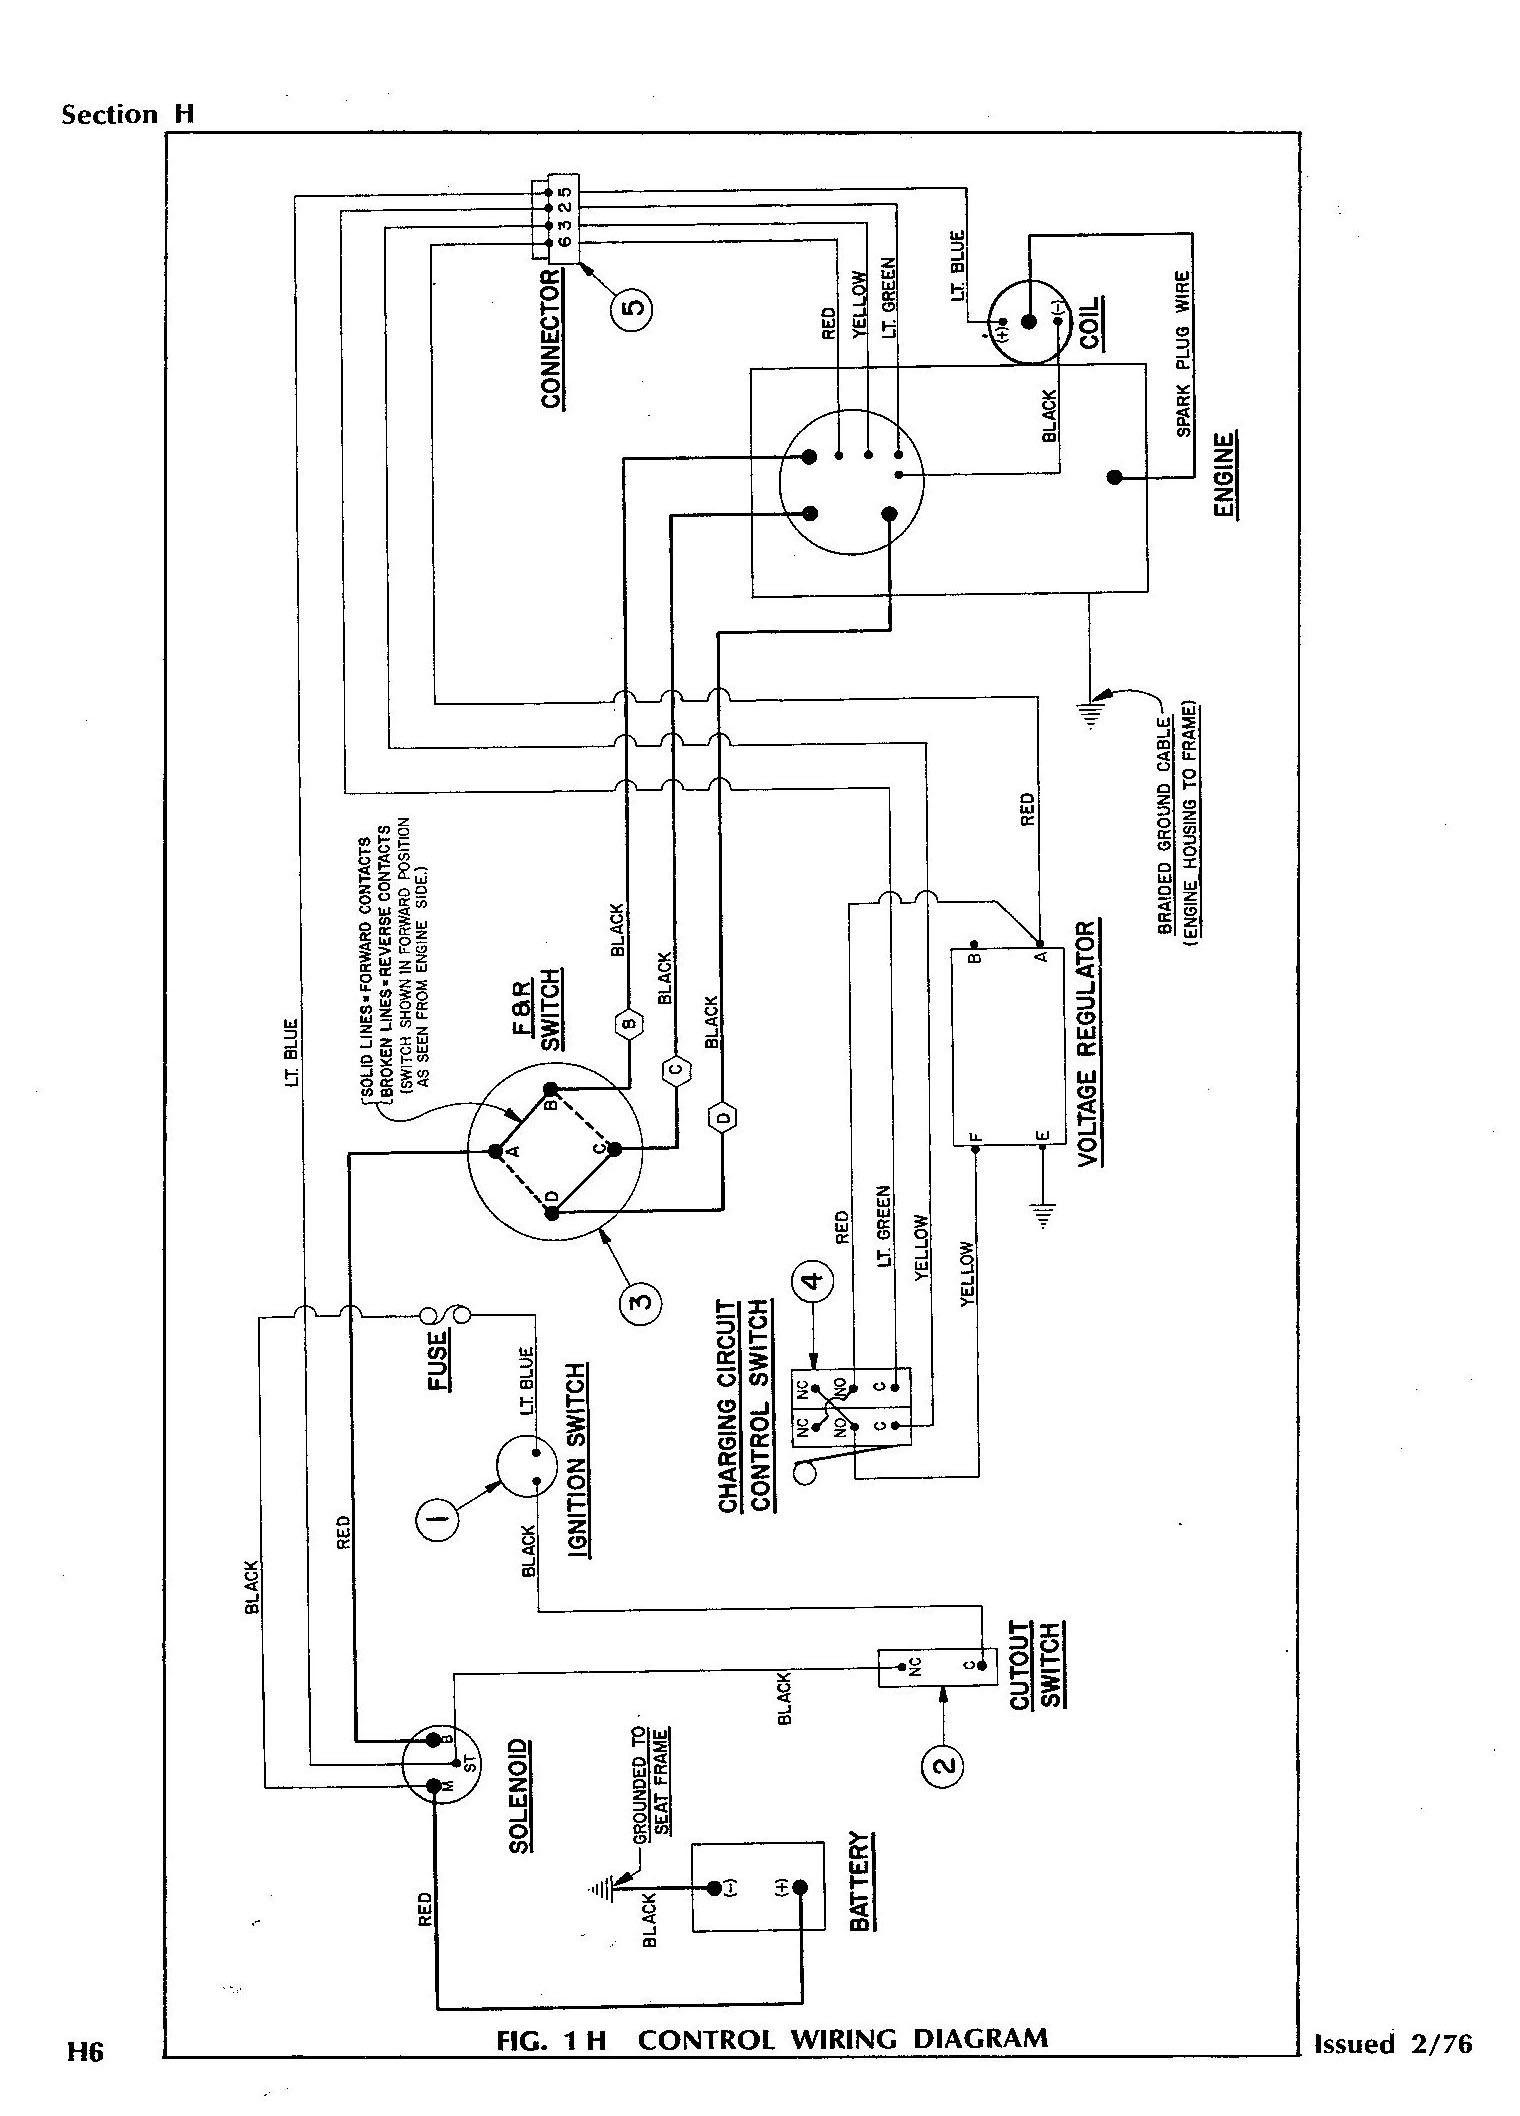 kart steering diagram on harley davidson golf cart gas engine